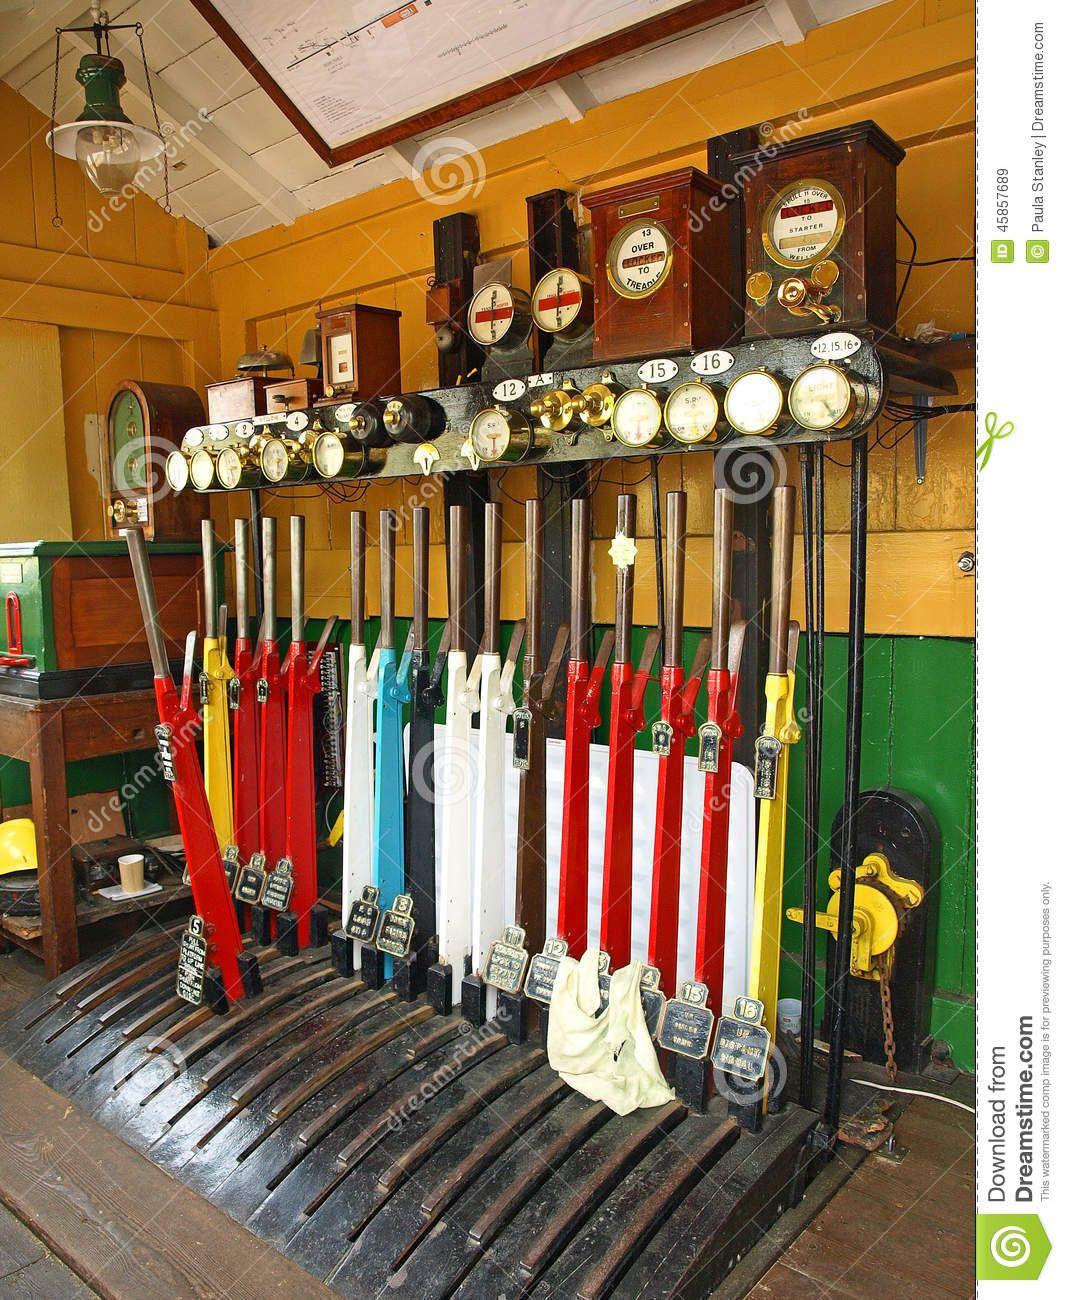 Washford station signal box, Somerset.